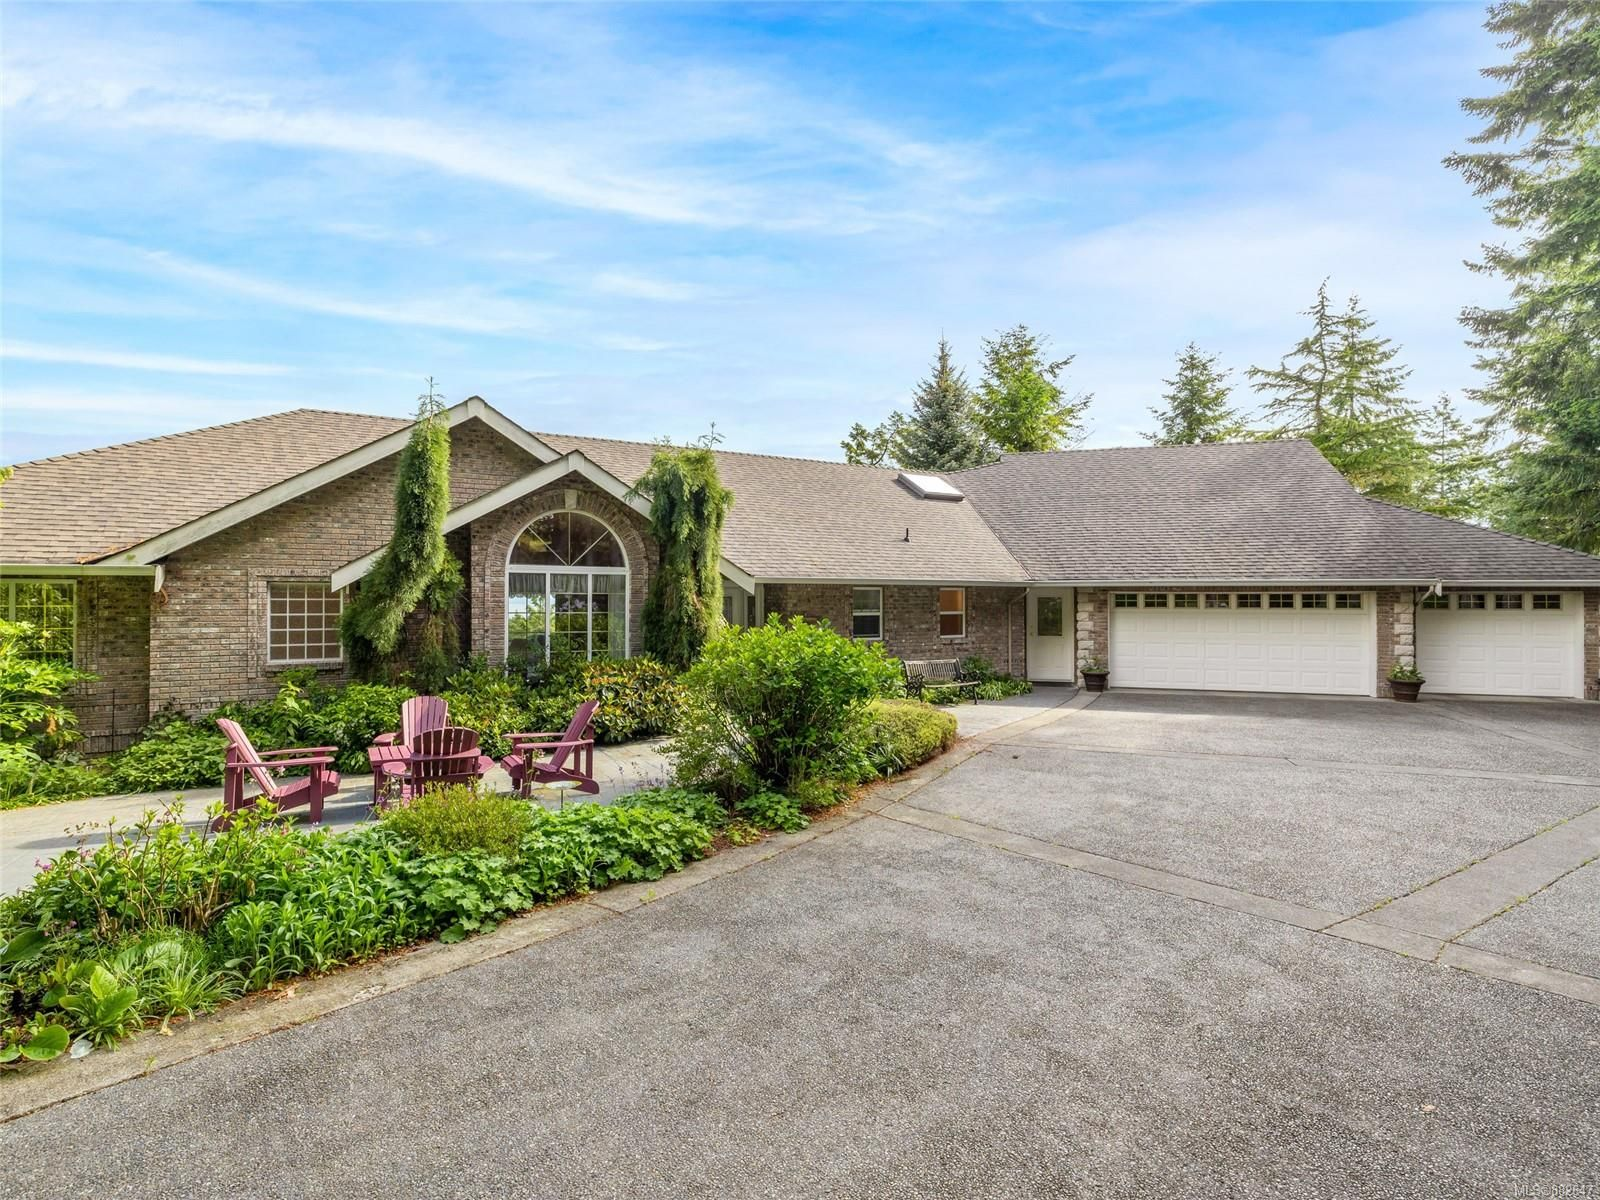 Main Photo: 6620 David Pl in : Na Upper Lantzville House for sale (Nanaimo)  : MLS®# 882647